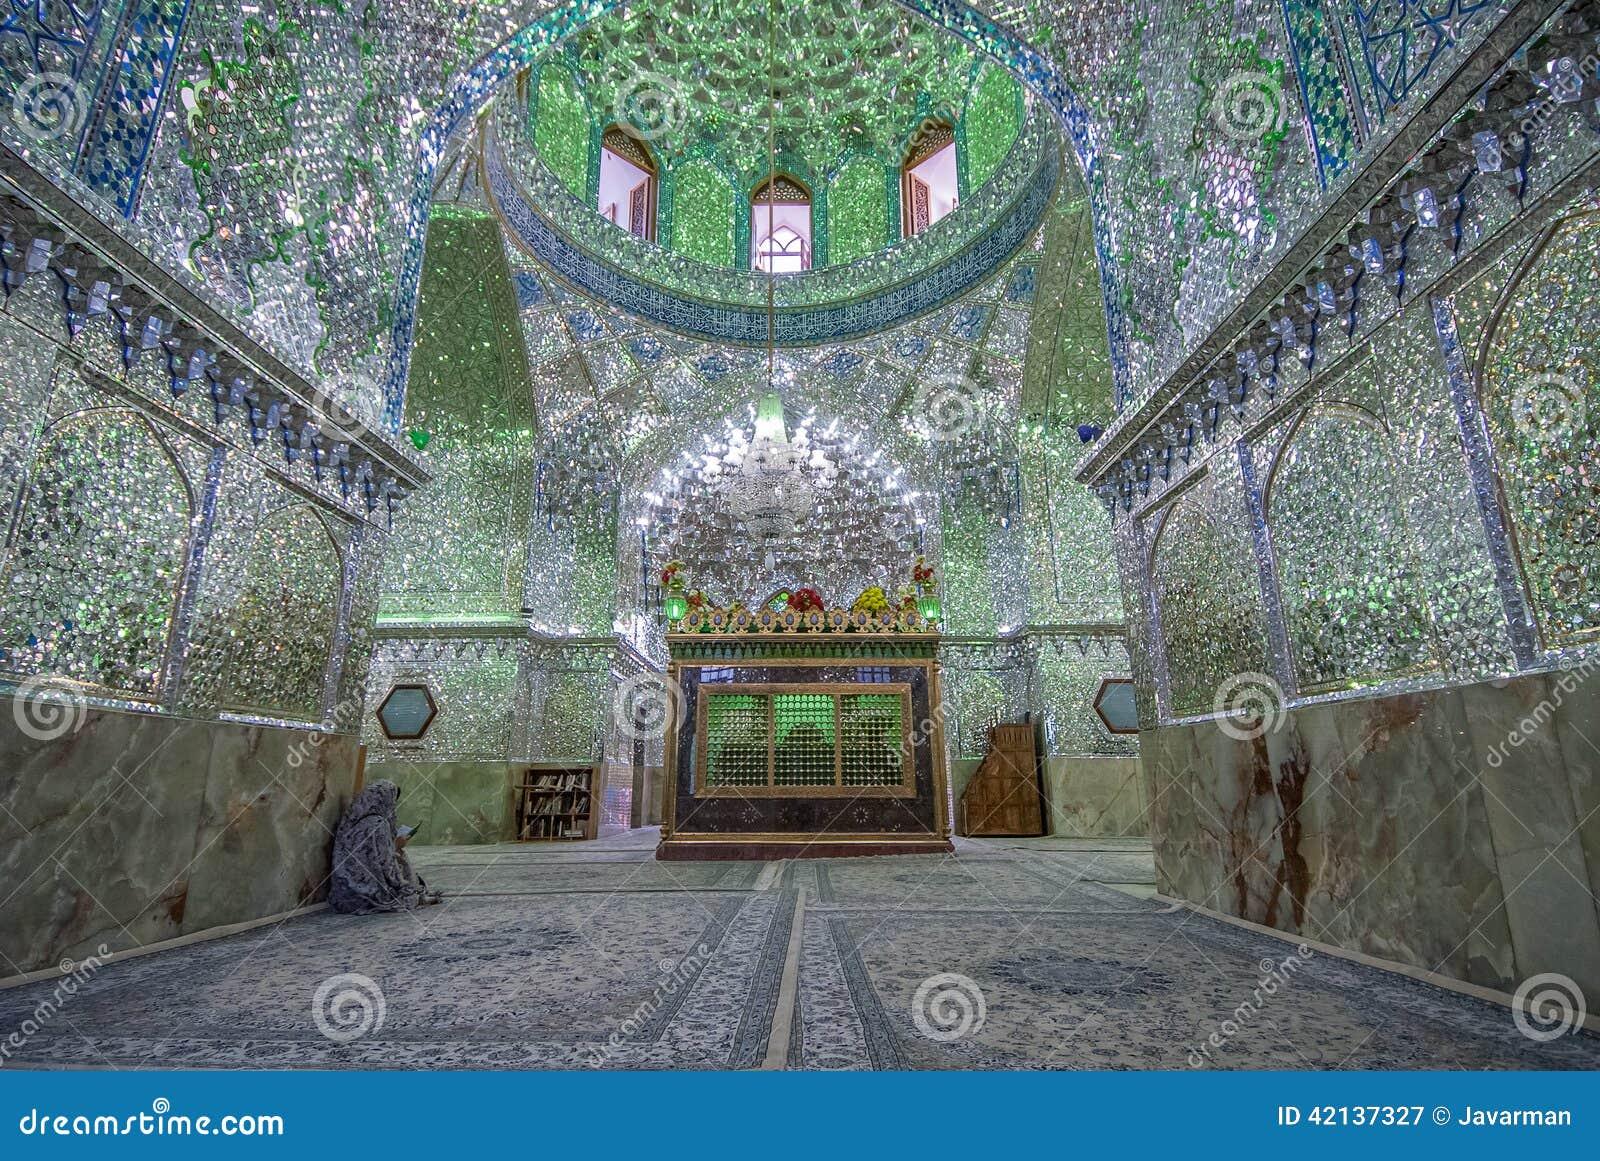 Shiraz Iran May 08 2007 Mirrored Mosque In Shiraz